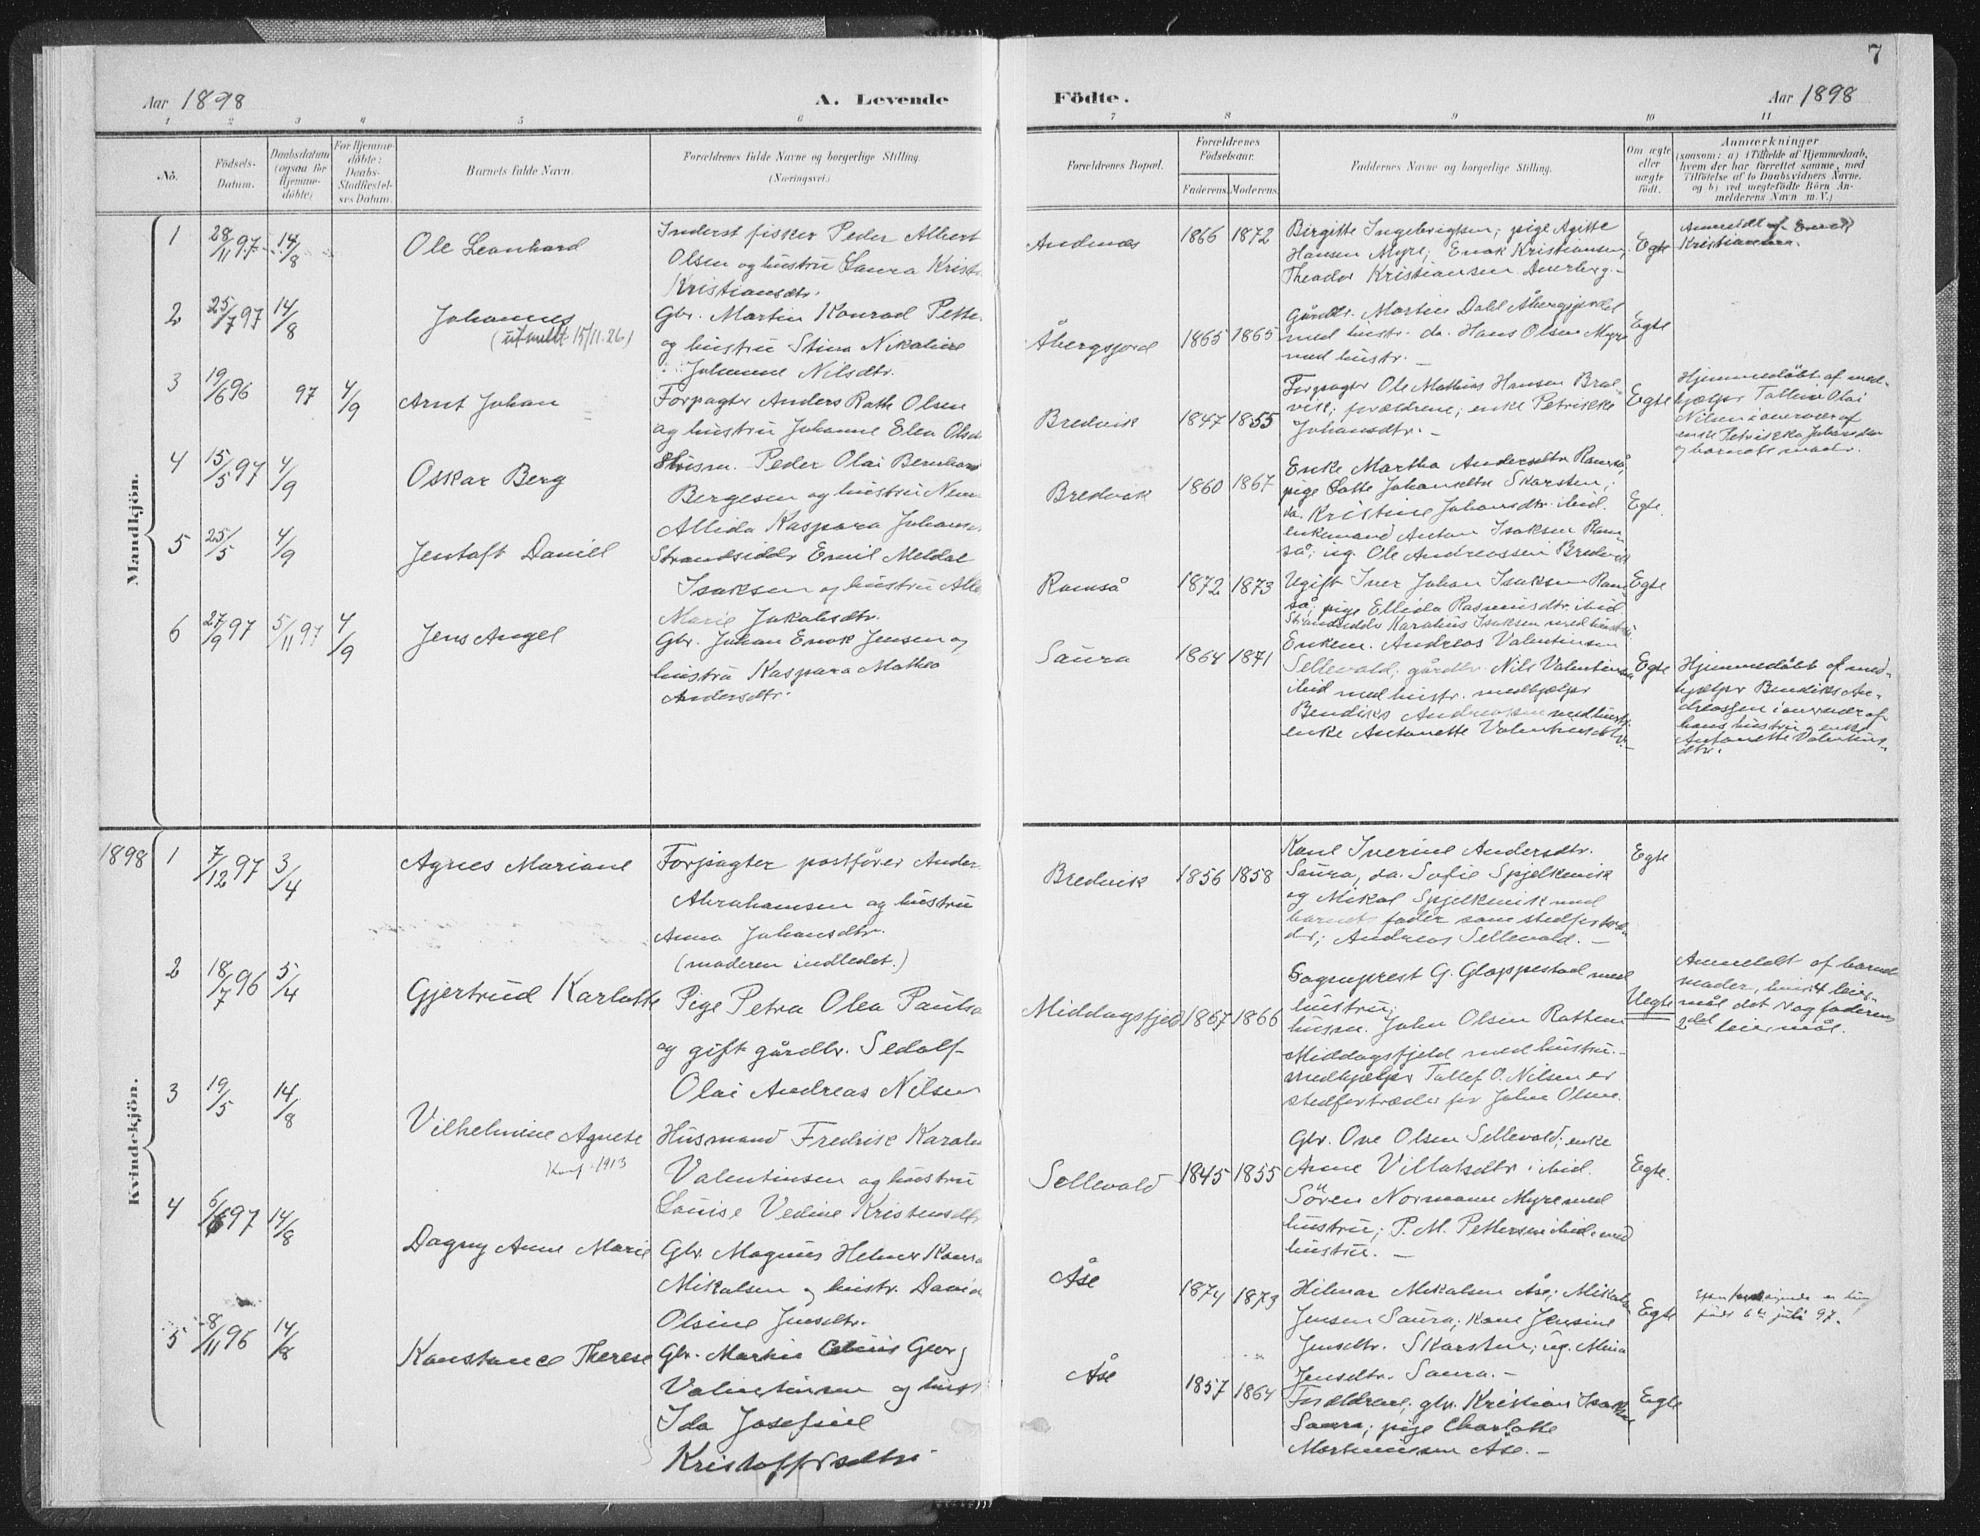 SAT, Ministerialprotokoller, klokkerbøker og fødselsregistre - Nordland, 897/L1400: Ministerialbok nr. 897A07, 1897-1908, s. 7